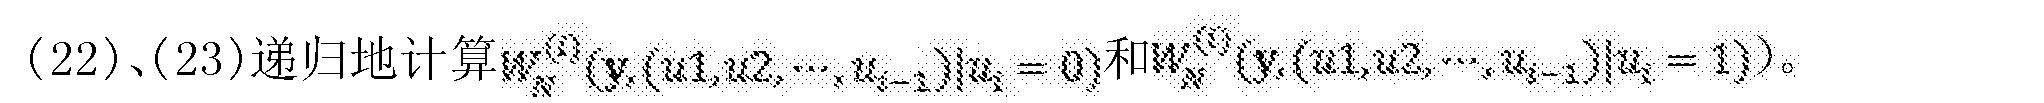 Figure CN105579972AD00256